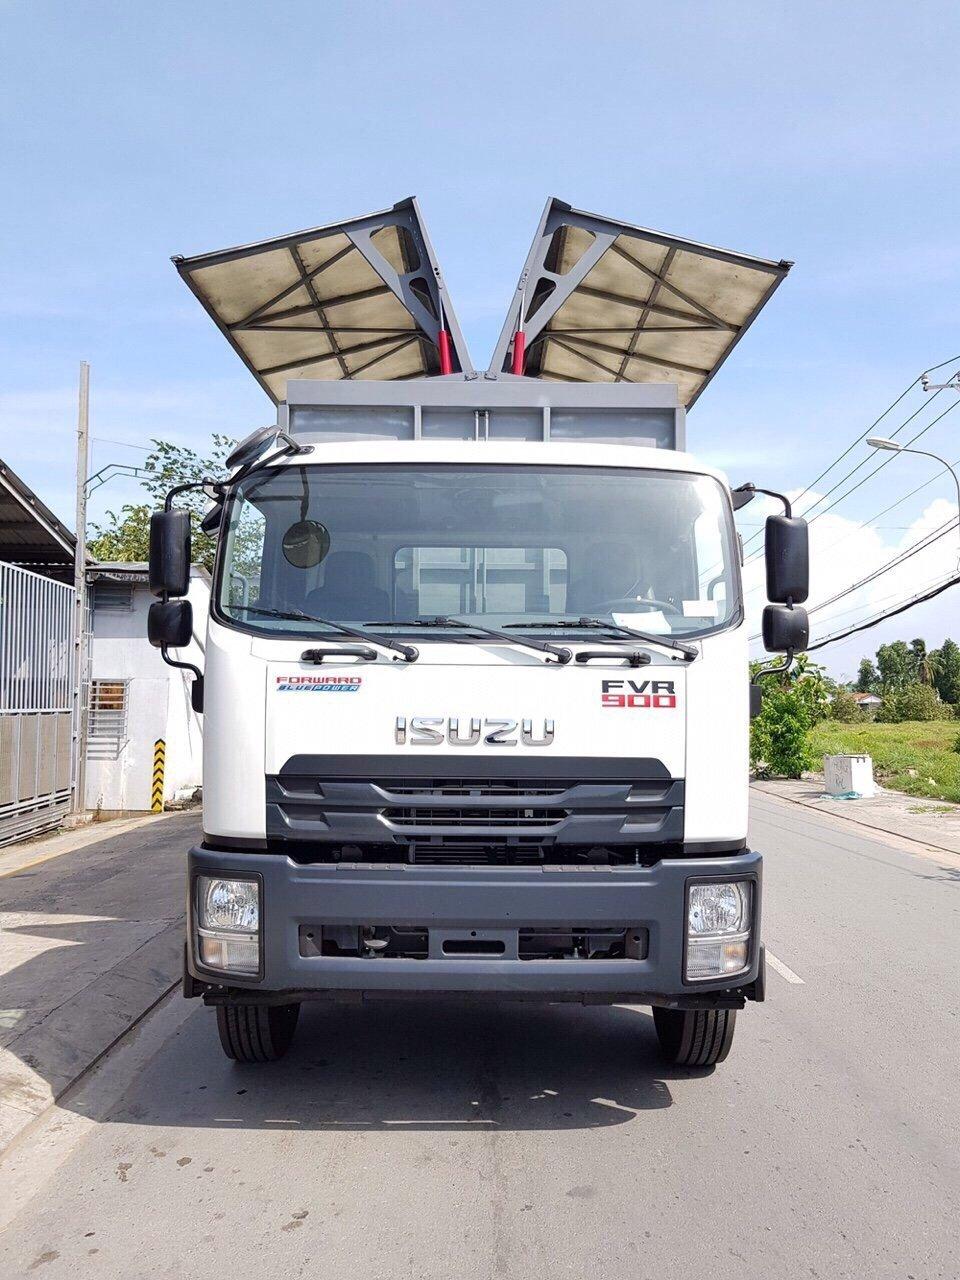 Isuzu 2019 nhập khẩu 9 tấn